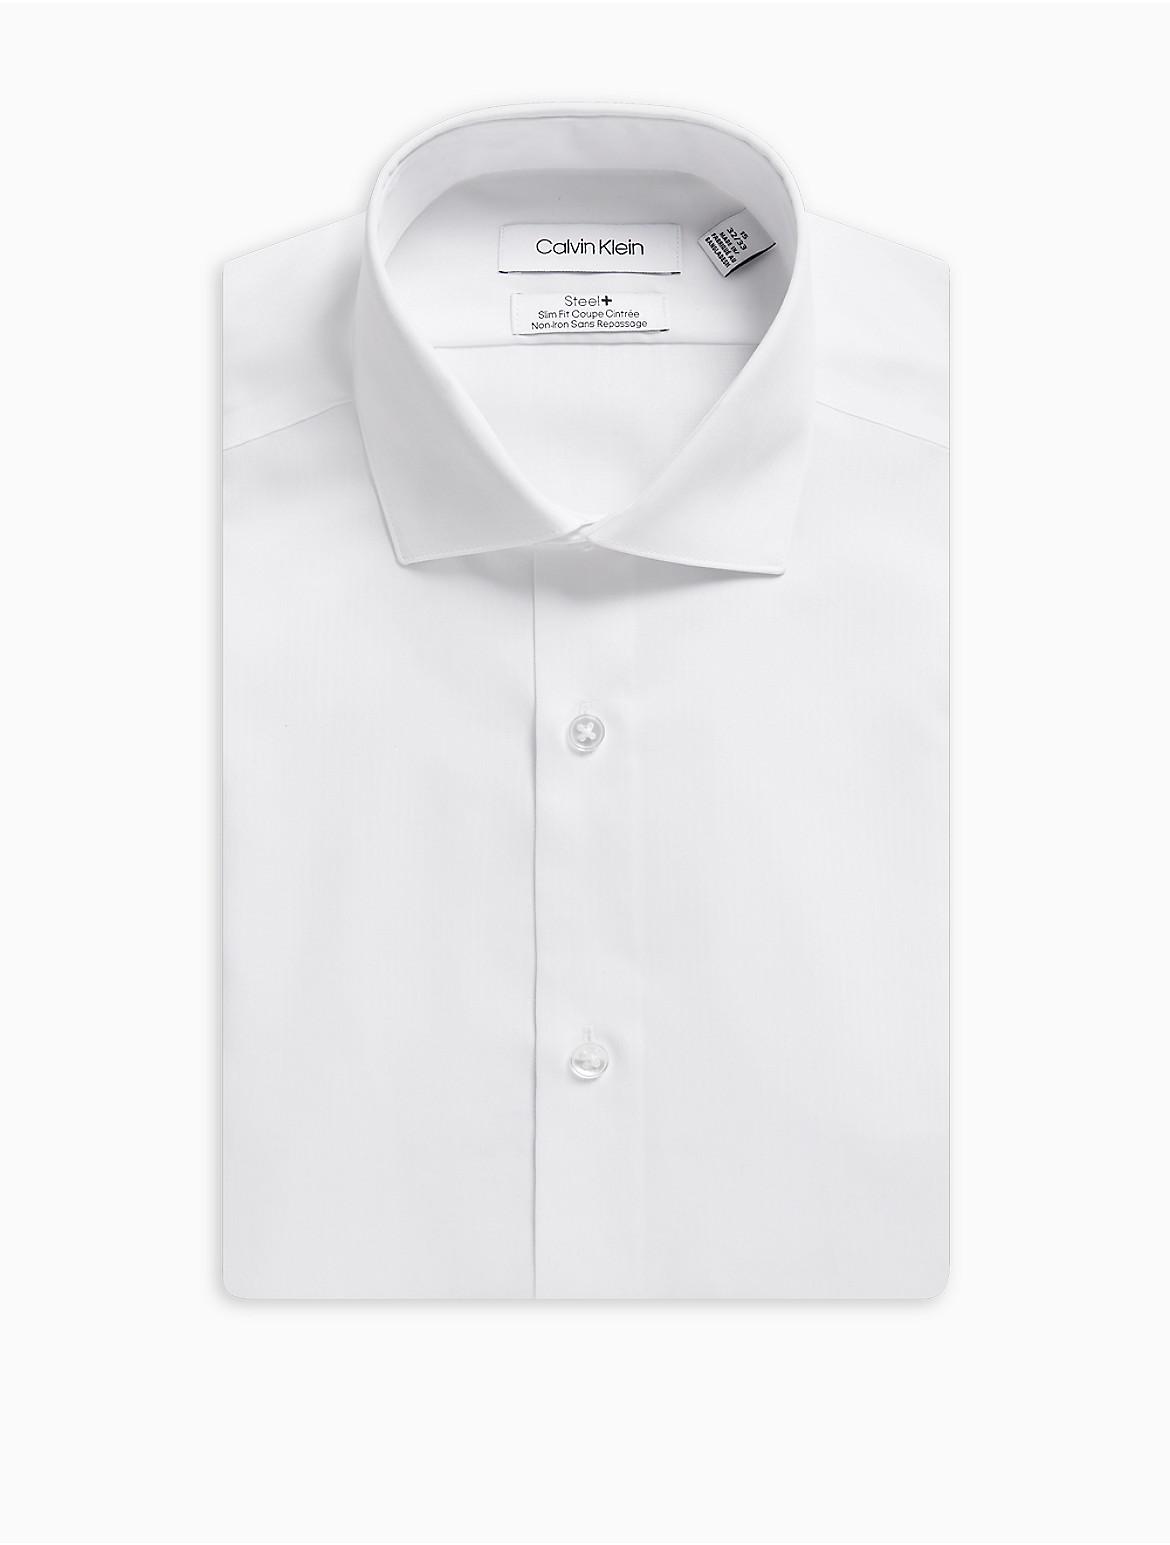 Steel Slim Fit Bedford French Cuff Non Iron Dress Shirt Calvin Klein